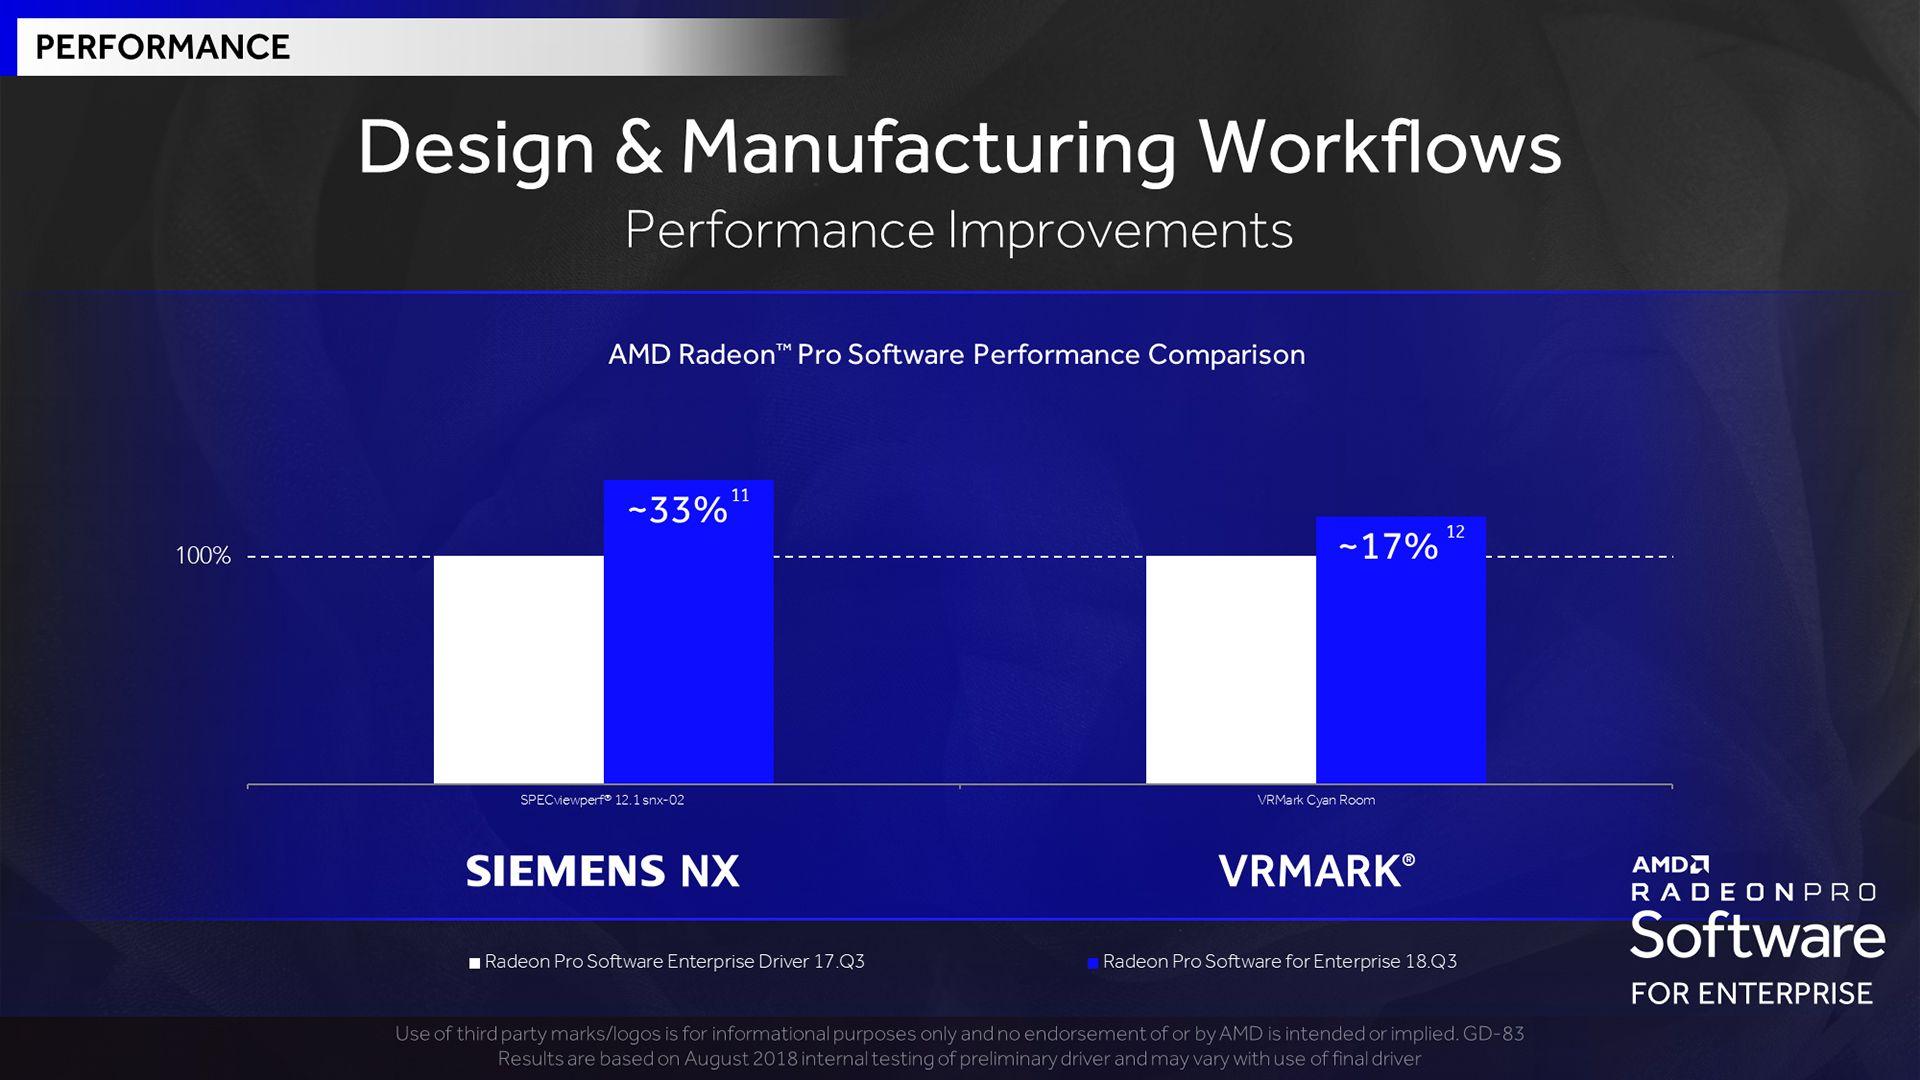 AMD Radeon Pro Software Enterprise 18.Q3